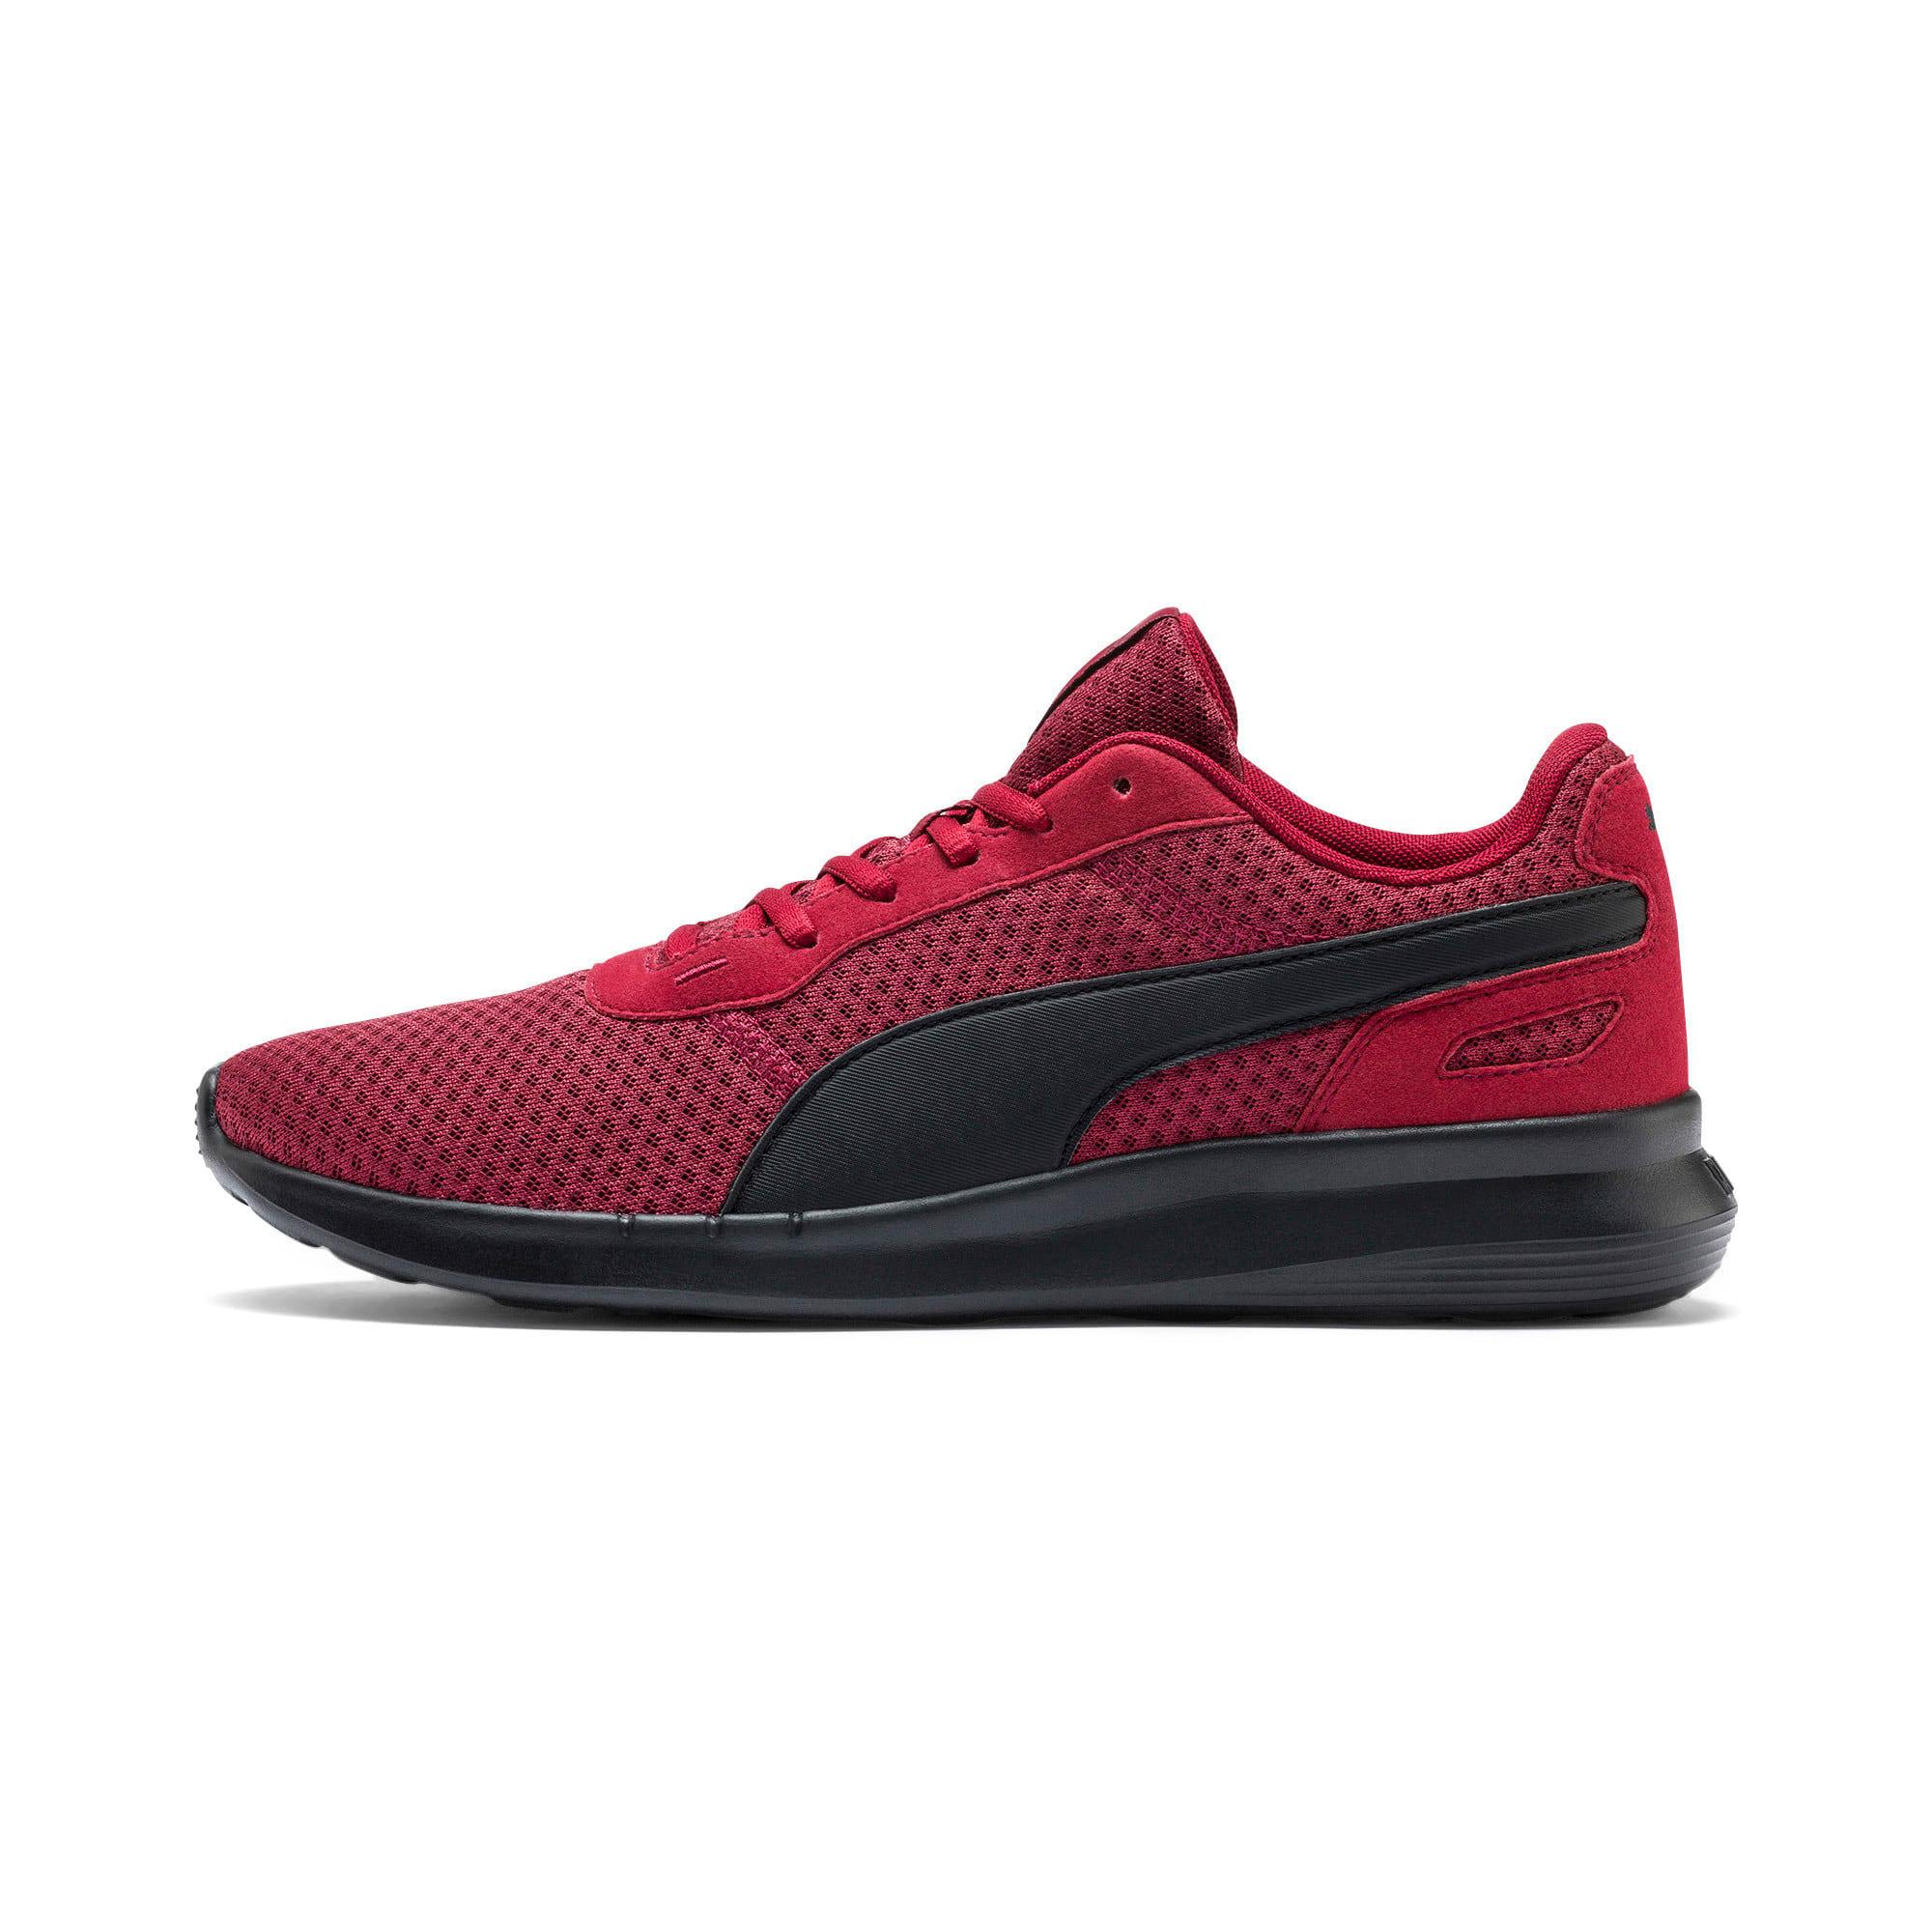 Thumbnail 1 of ST Activate Sneakers, Rhubarb-Puma Black, medium